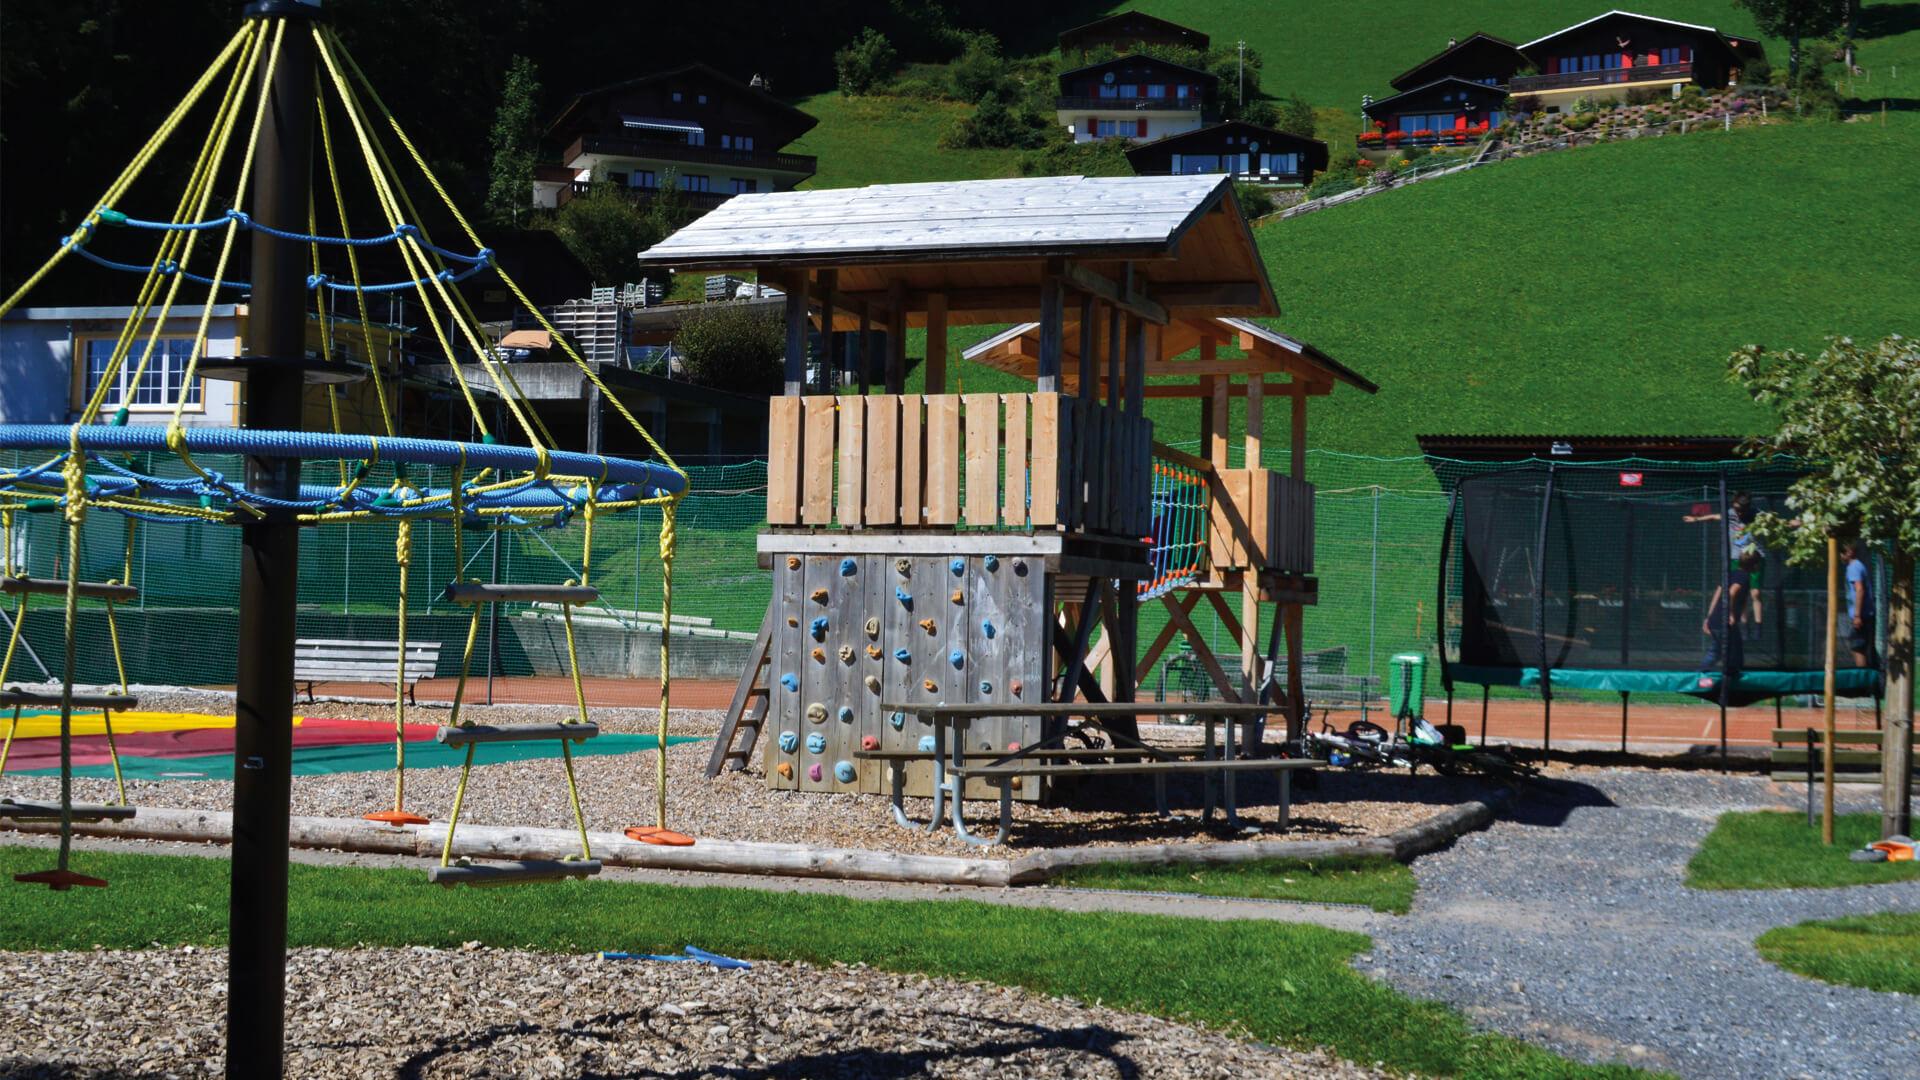 beatenberg-spielplatz-drehschaukel